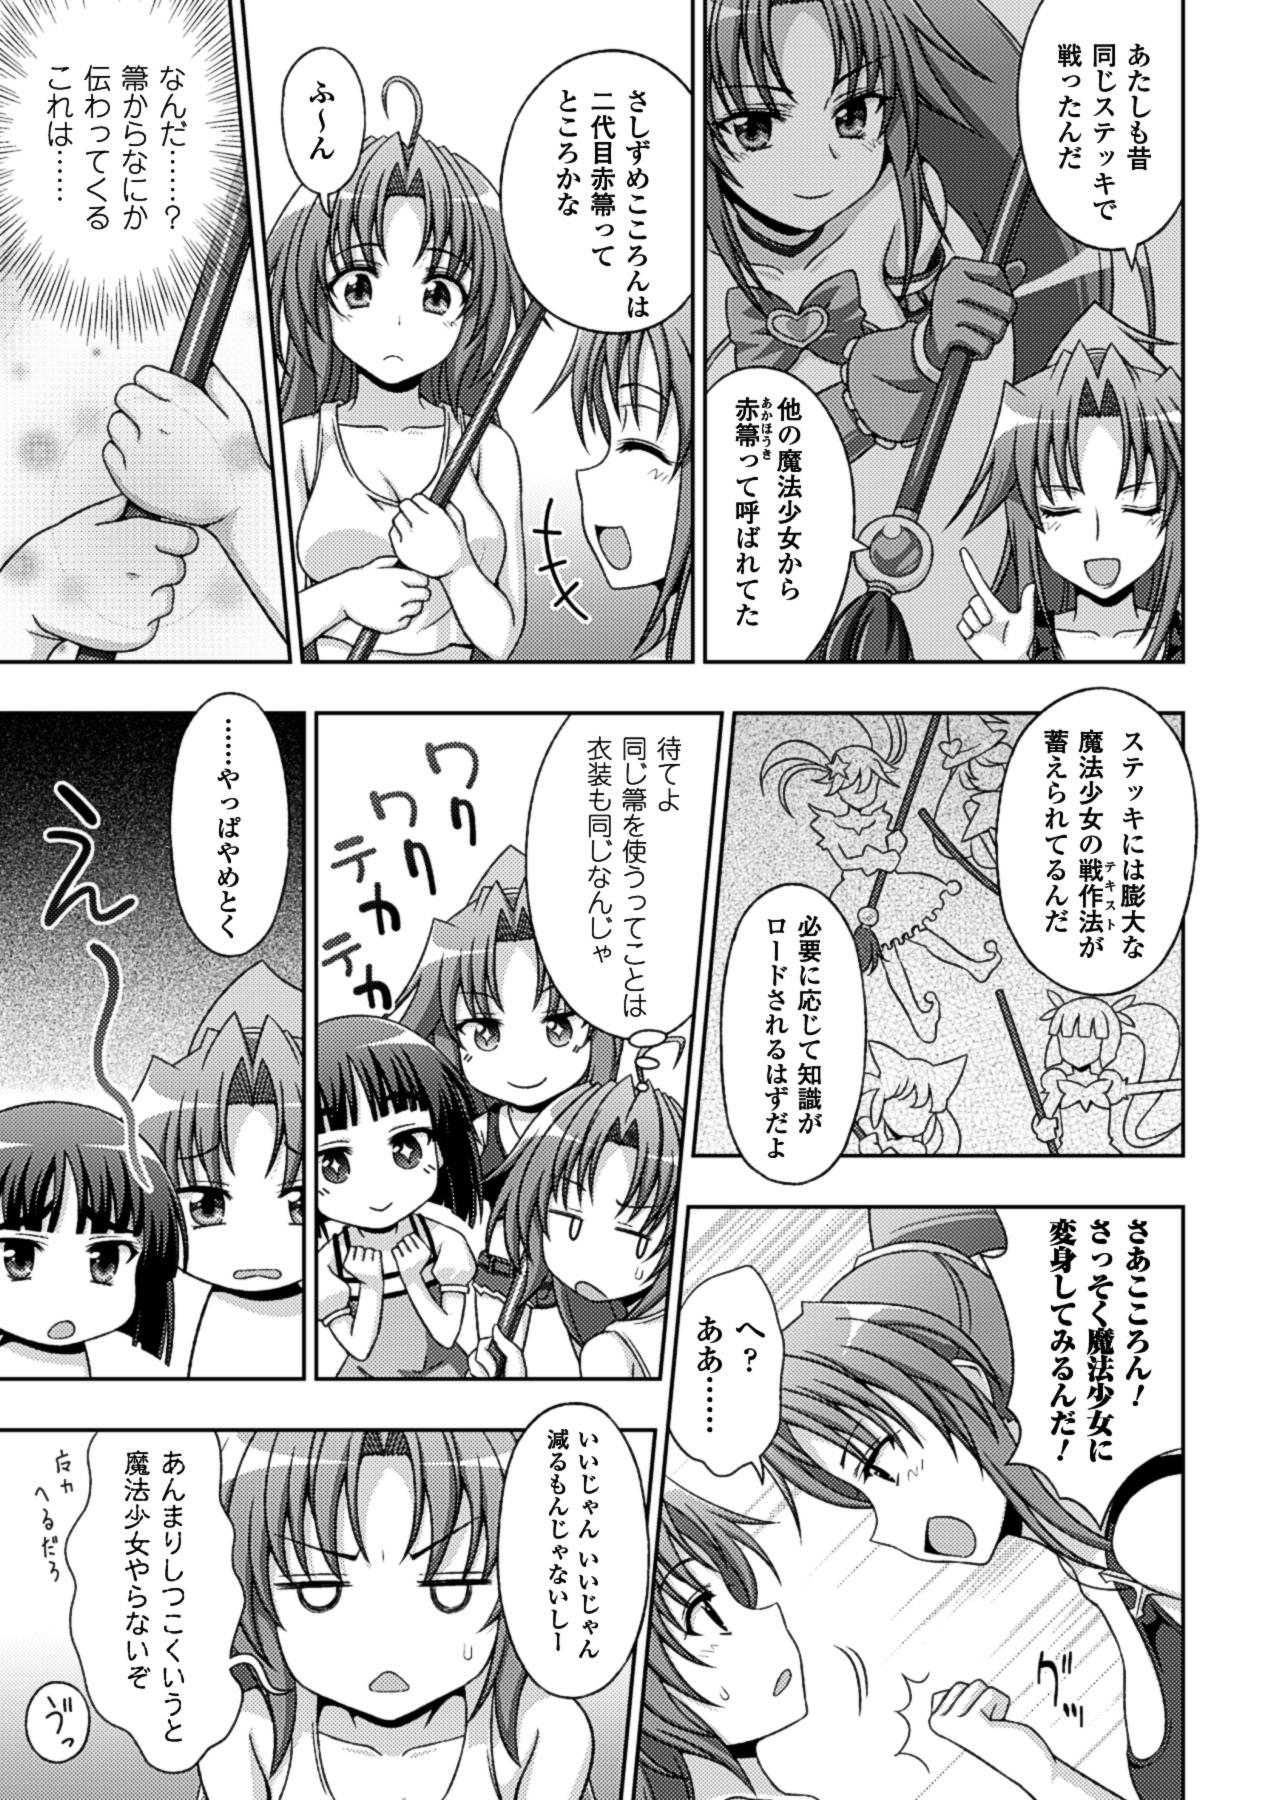 Megami Crisis 10 28